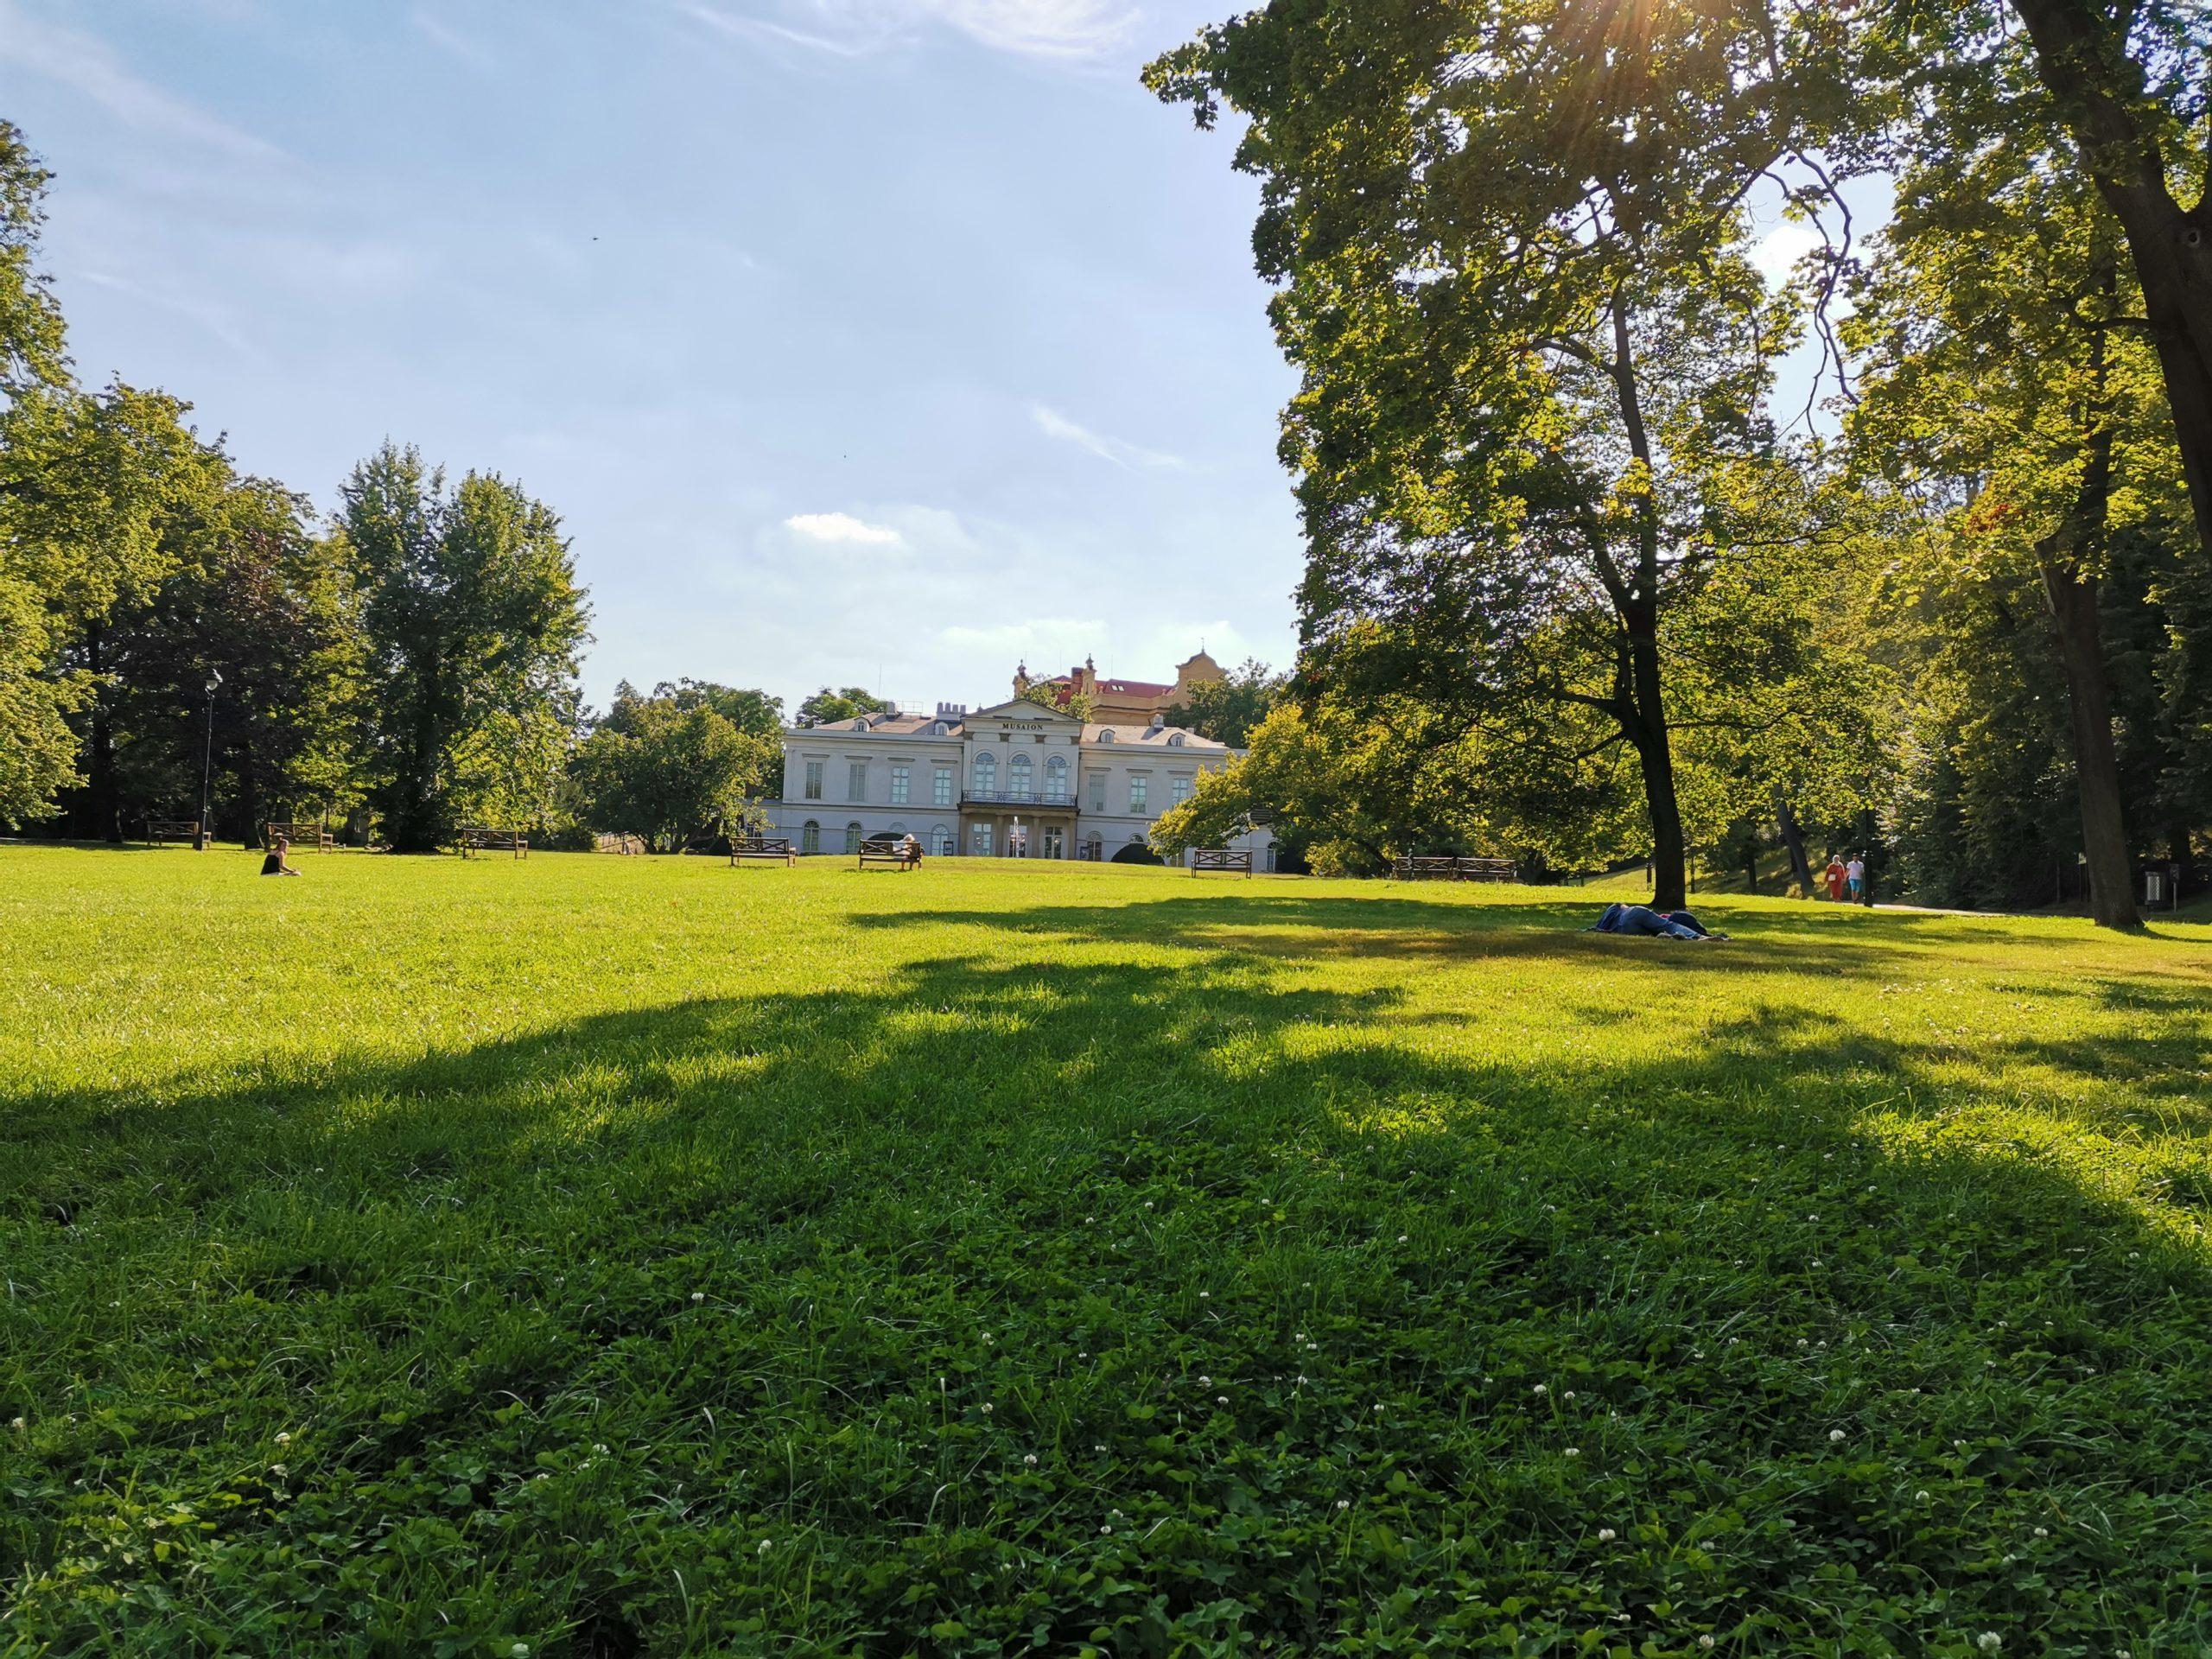 Musaion-(Kinsky-Summer-House)